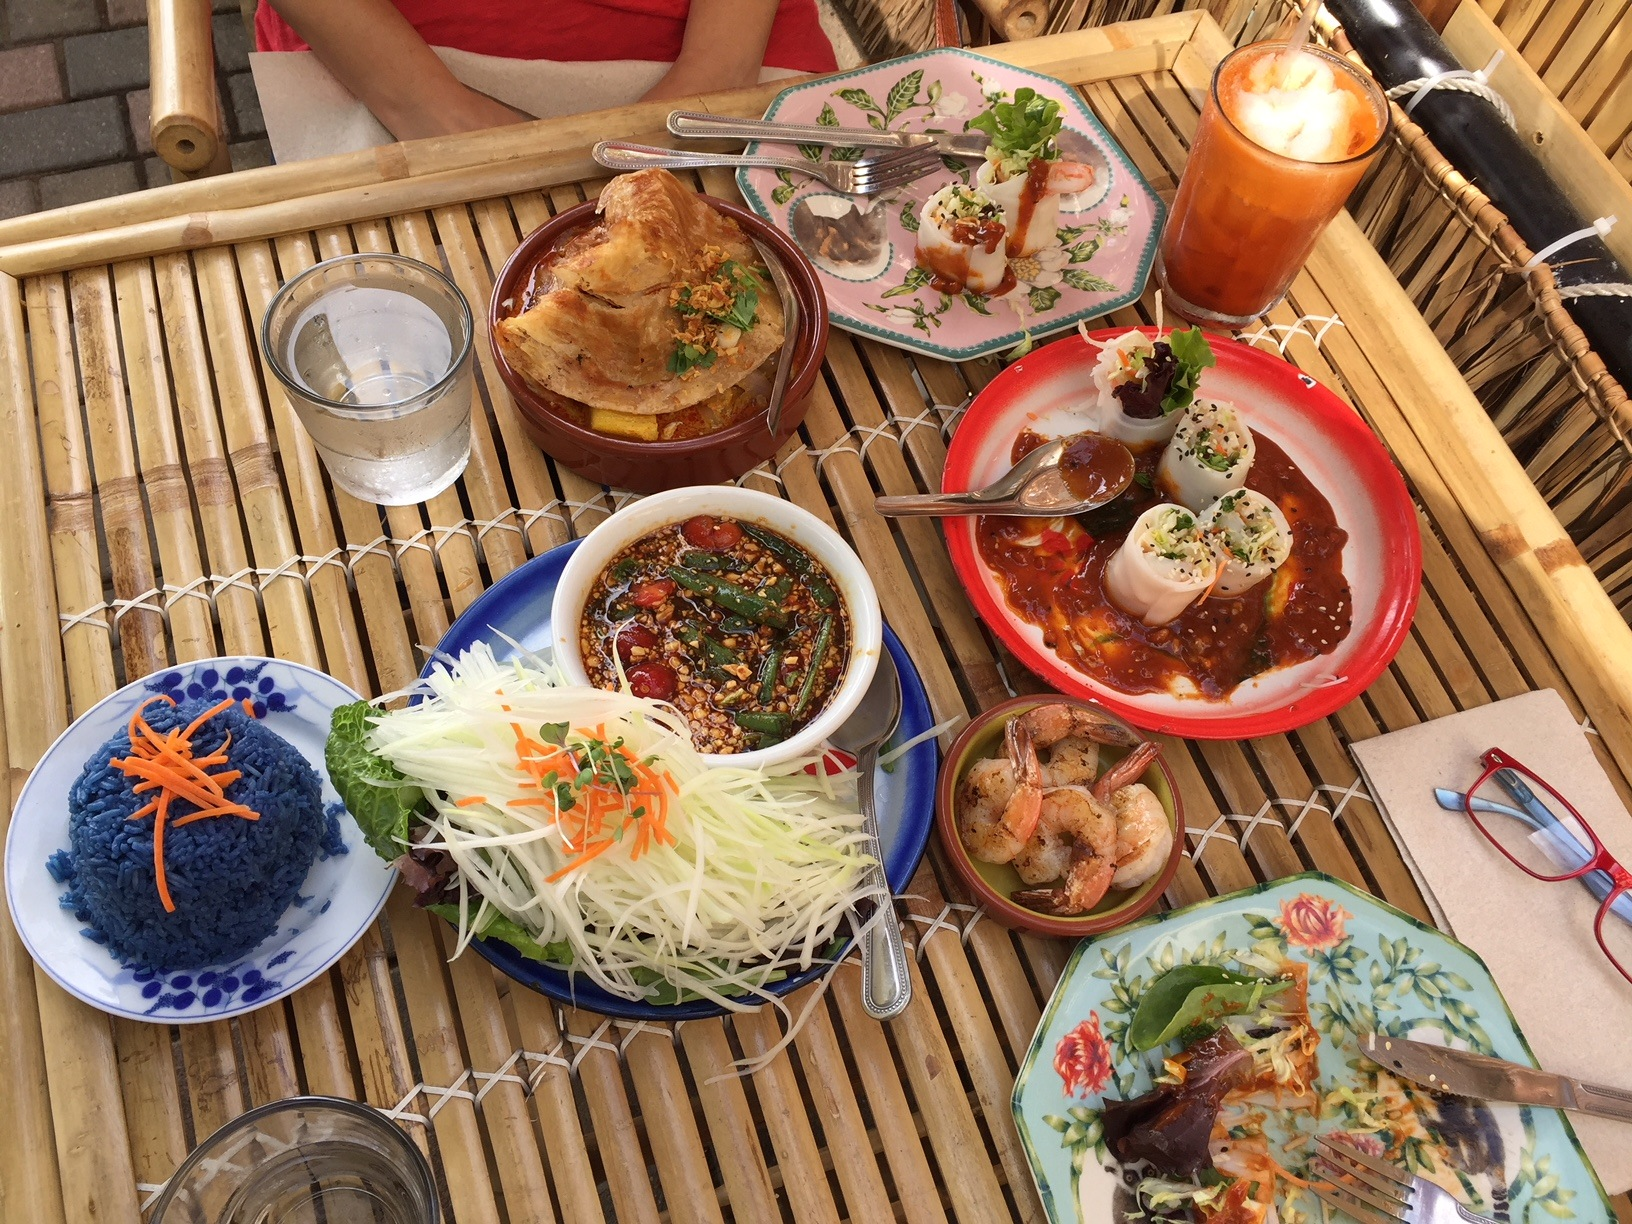 Food at the Farmhouse Thai Restaurant